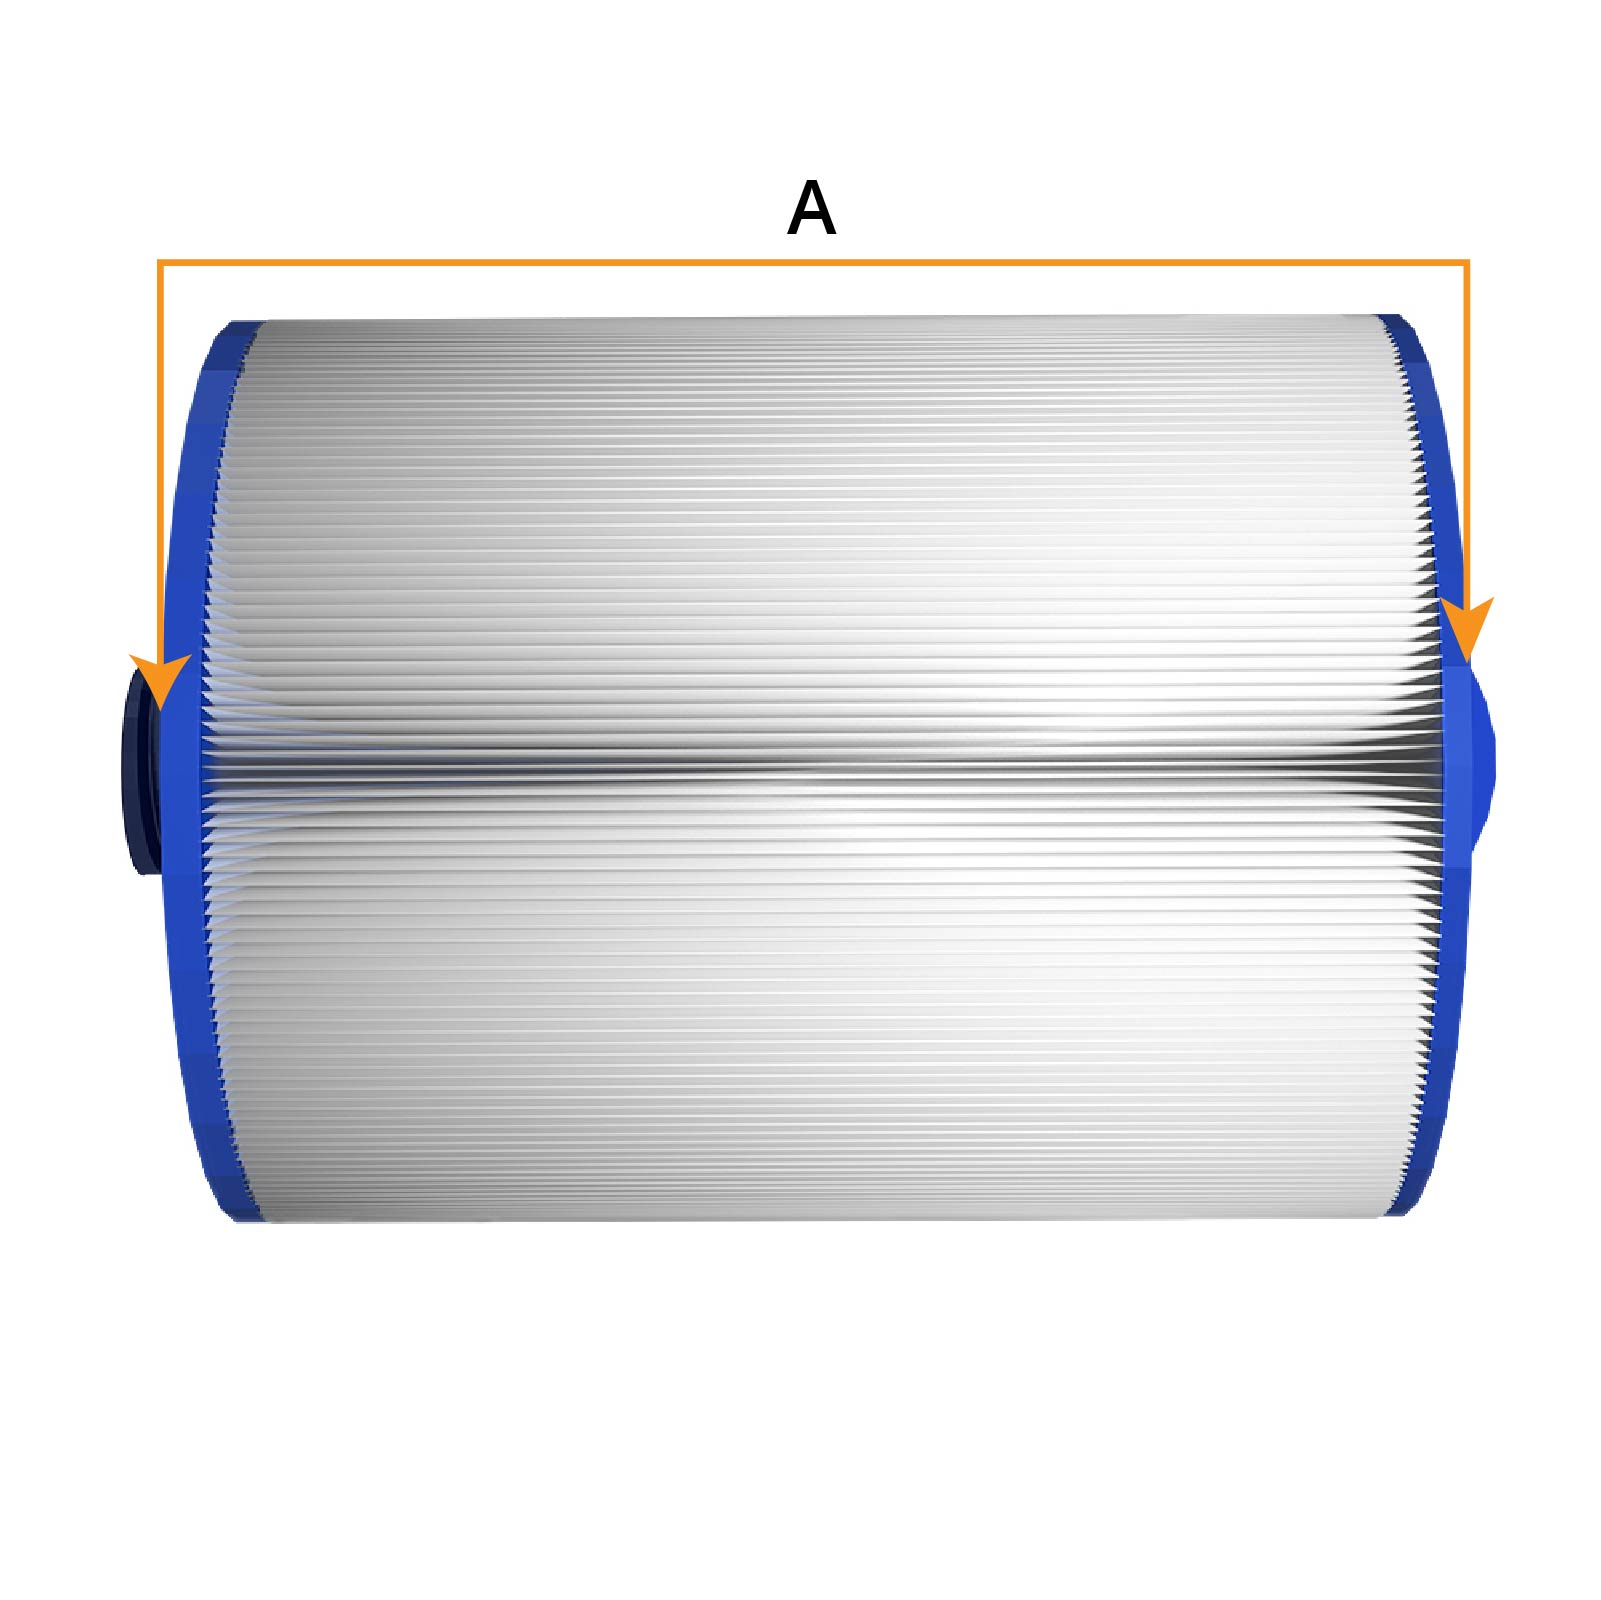 Filter-Länge Messen